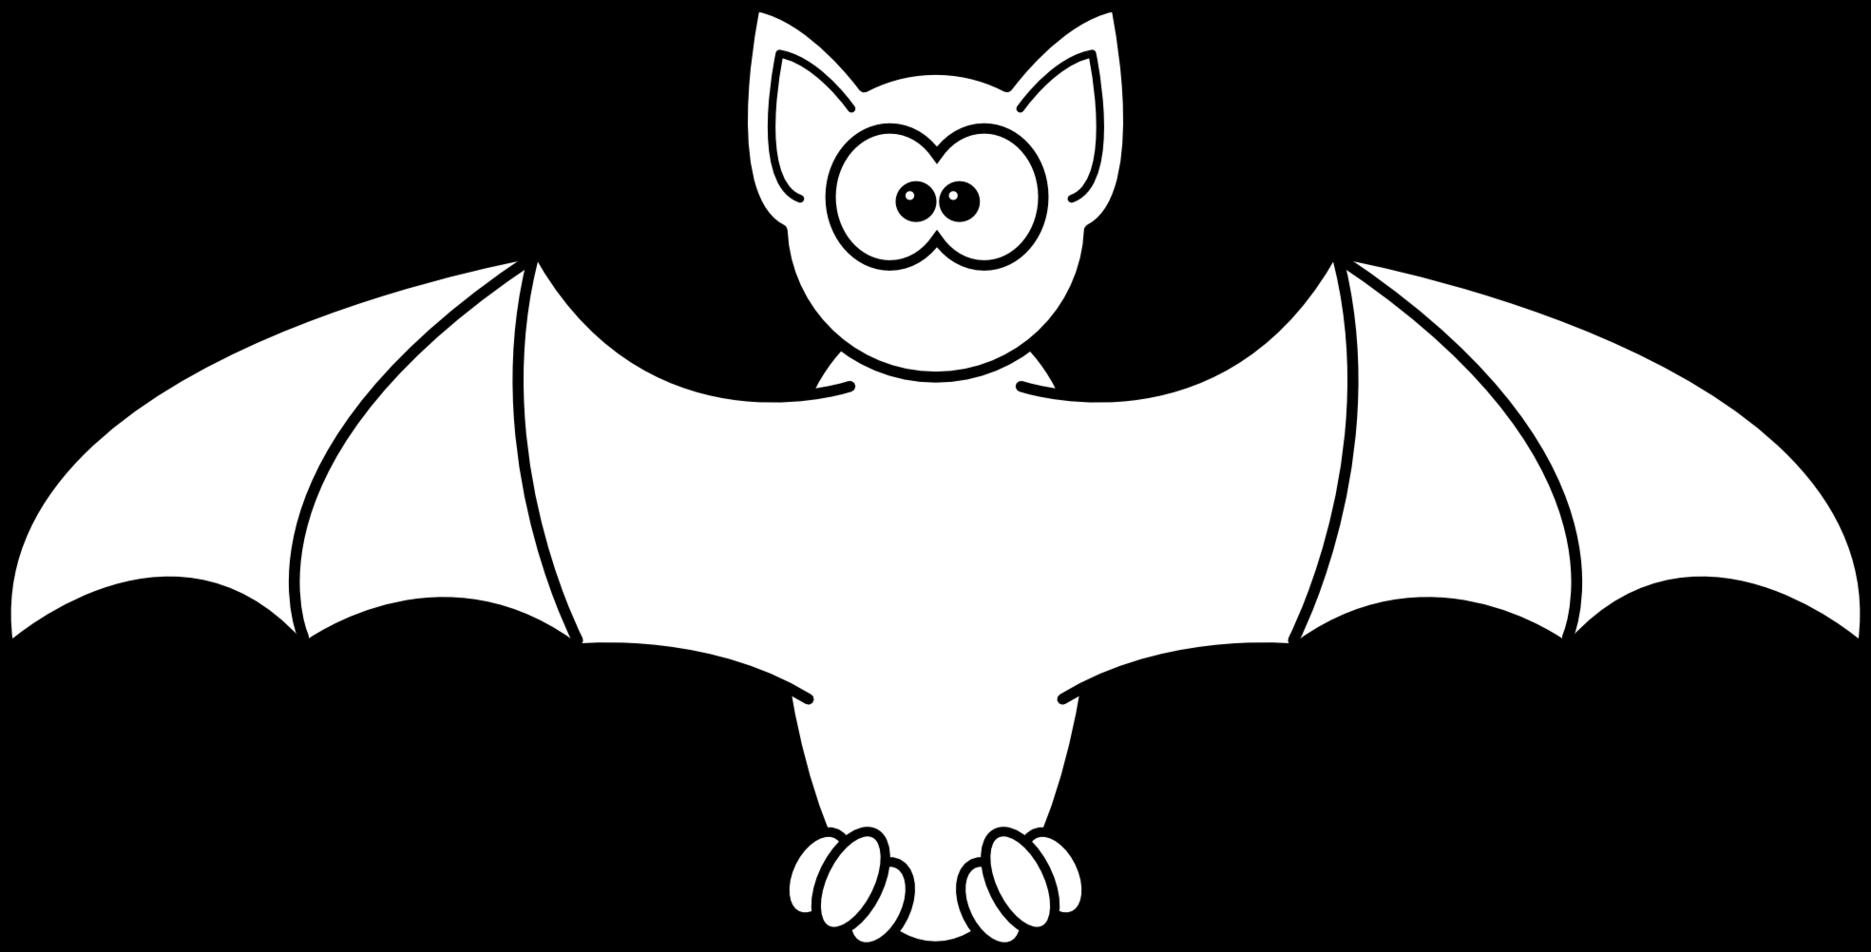 Bat clipart line art. Halloween bats free download